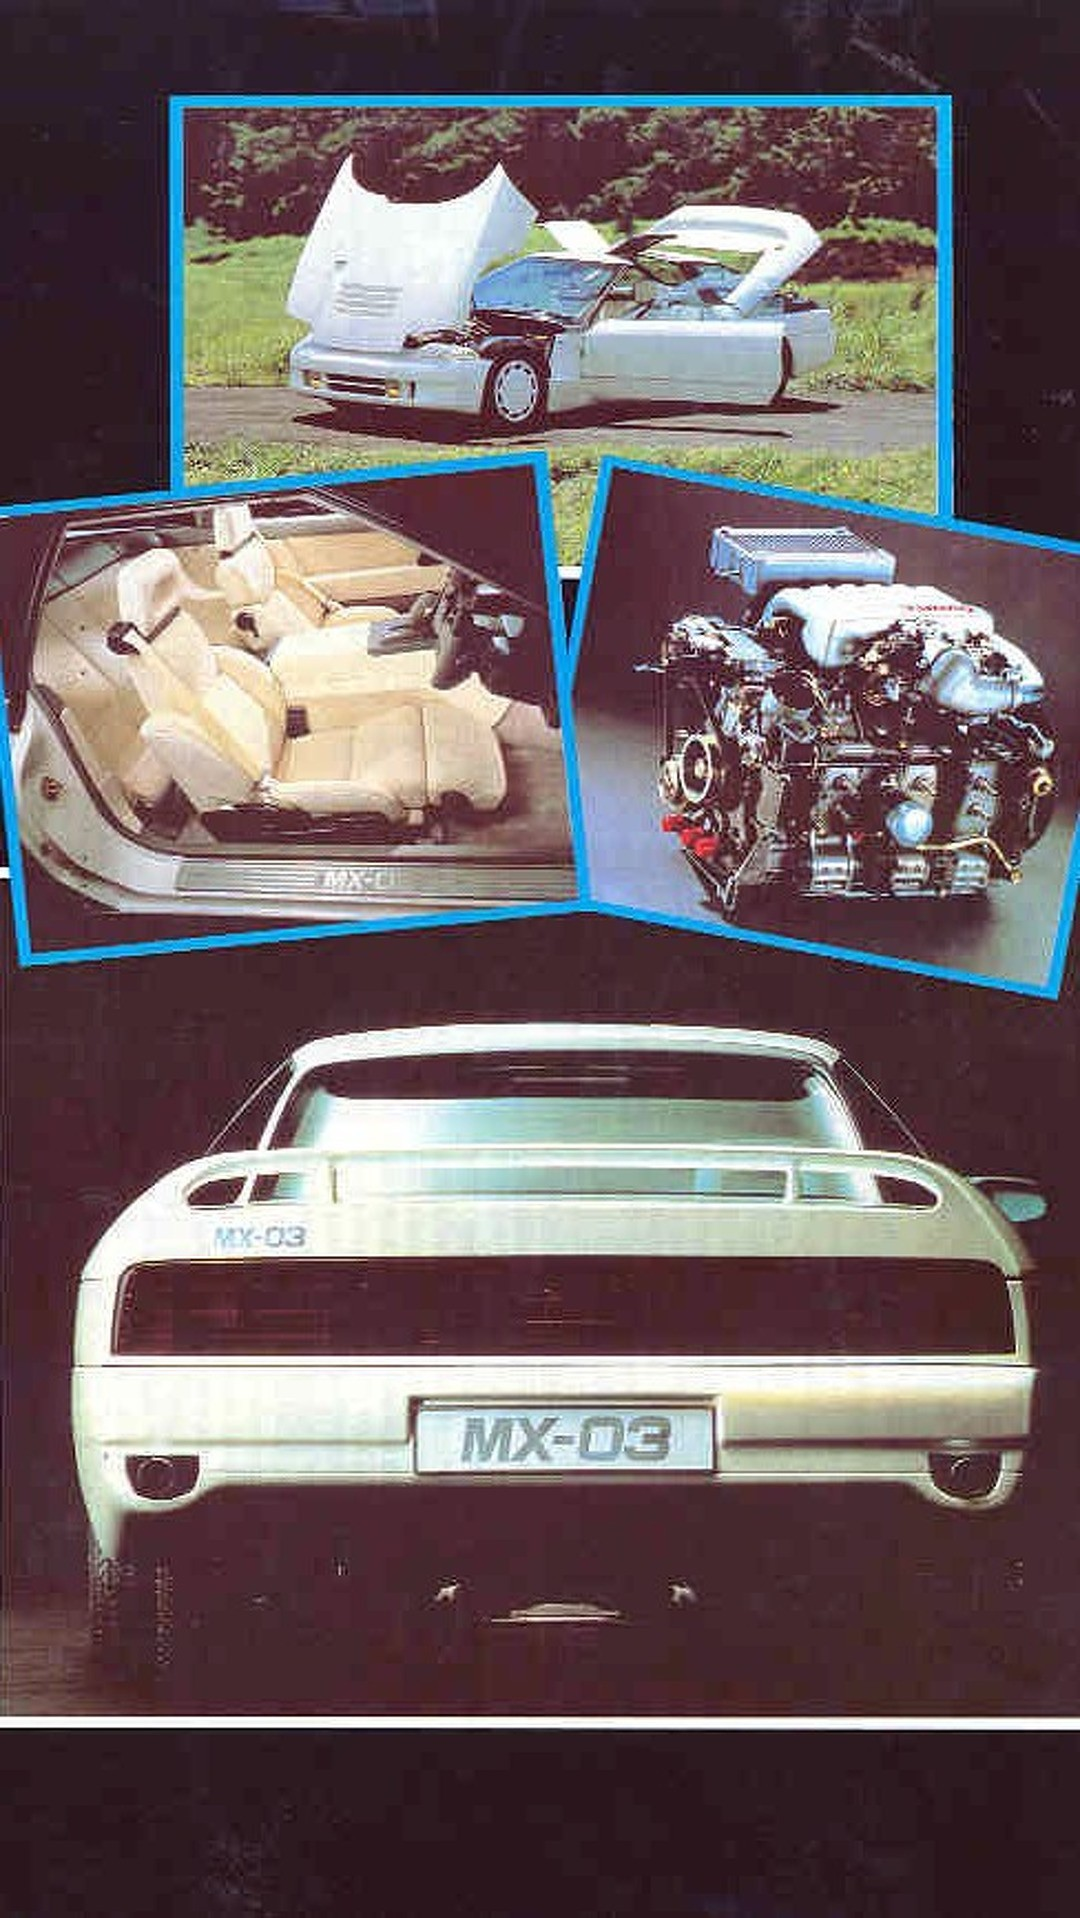 1985-mazda-mx-03-concept6